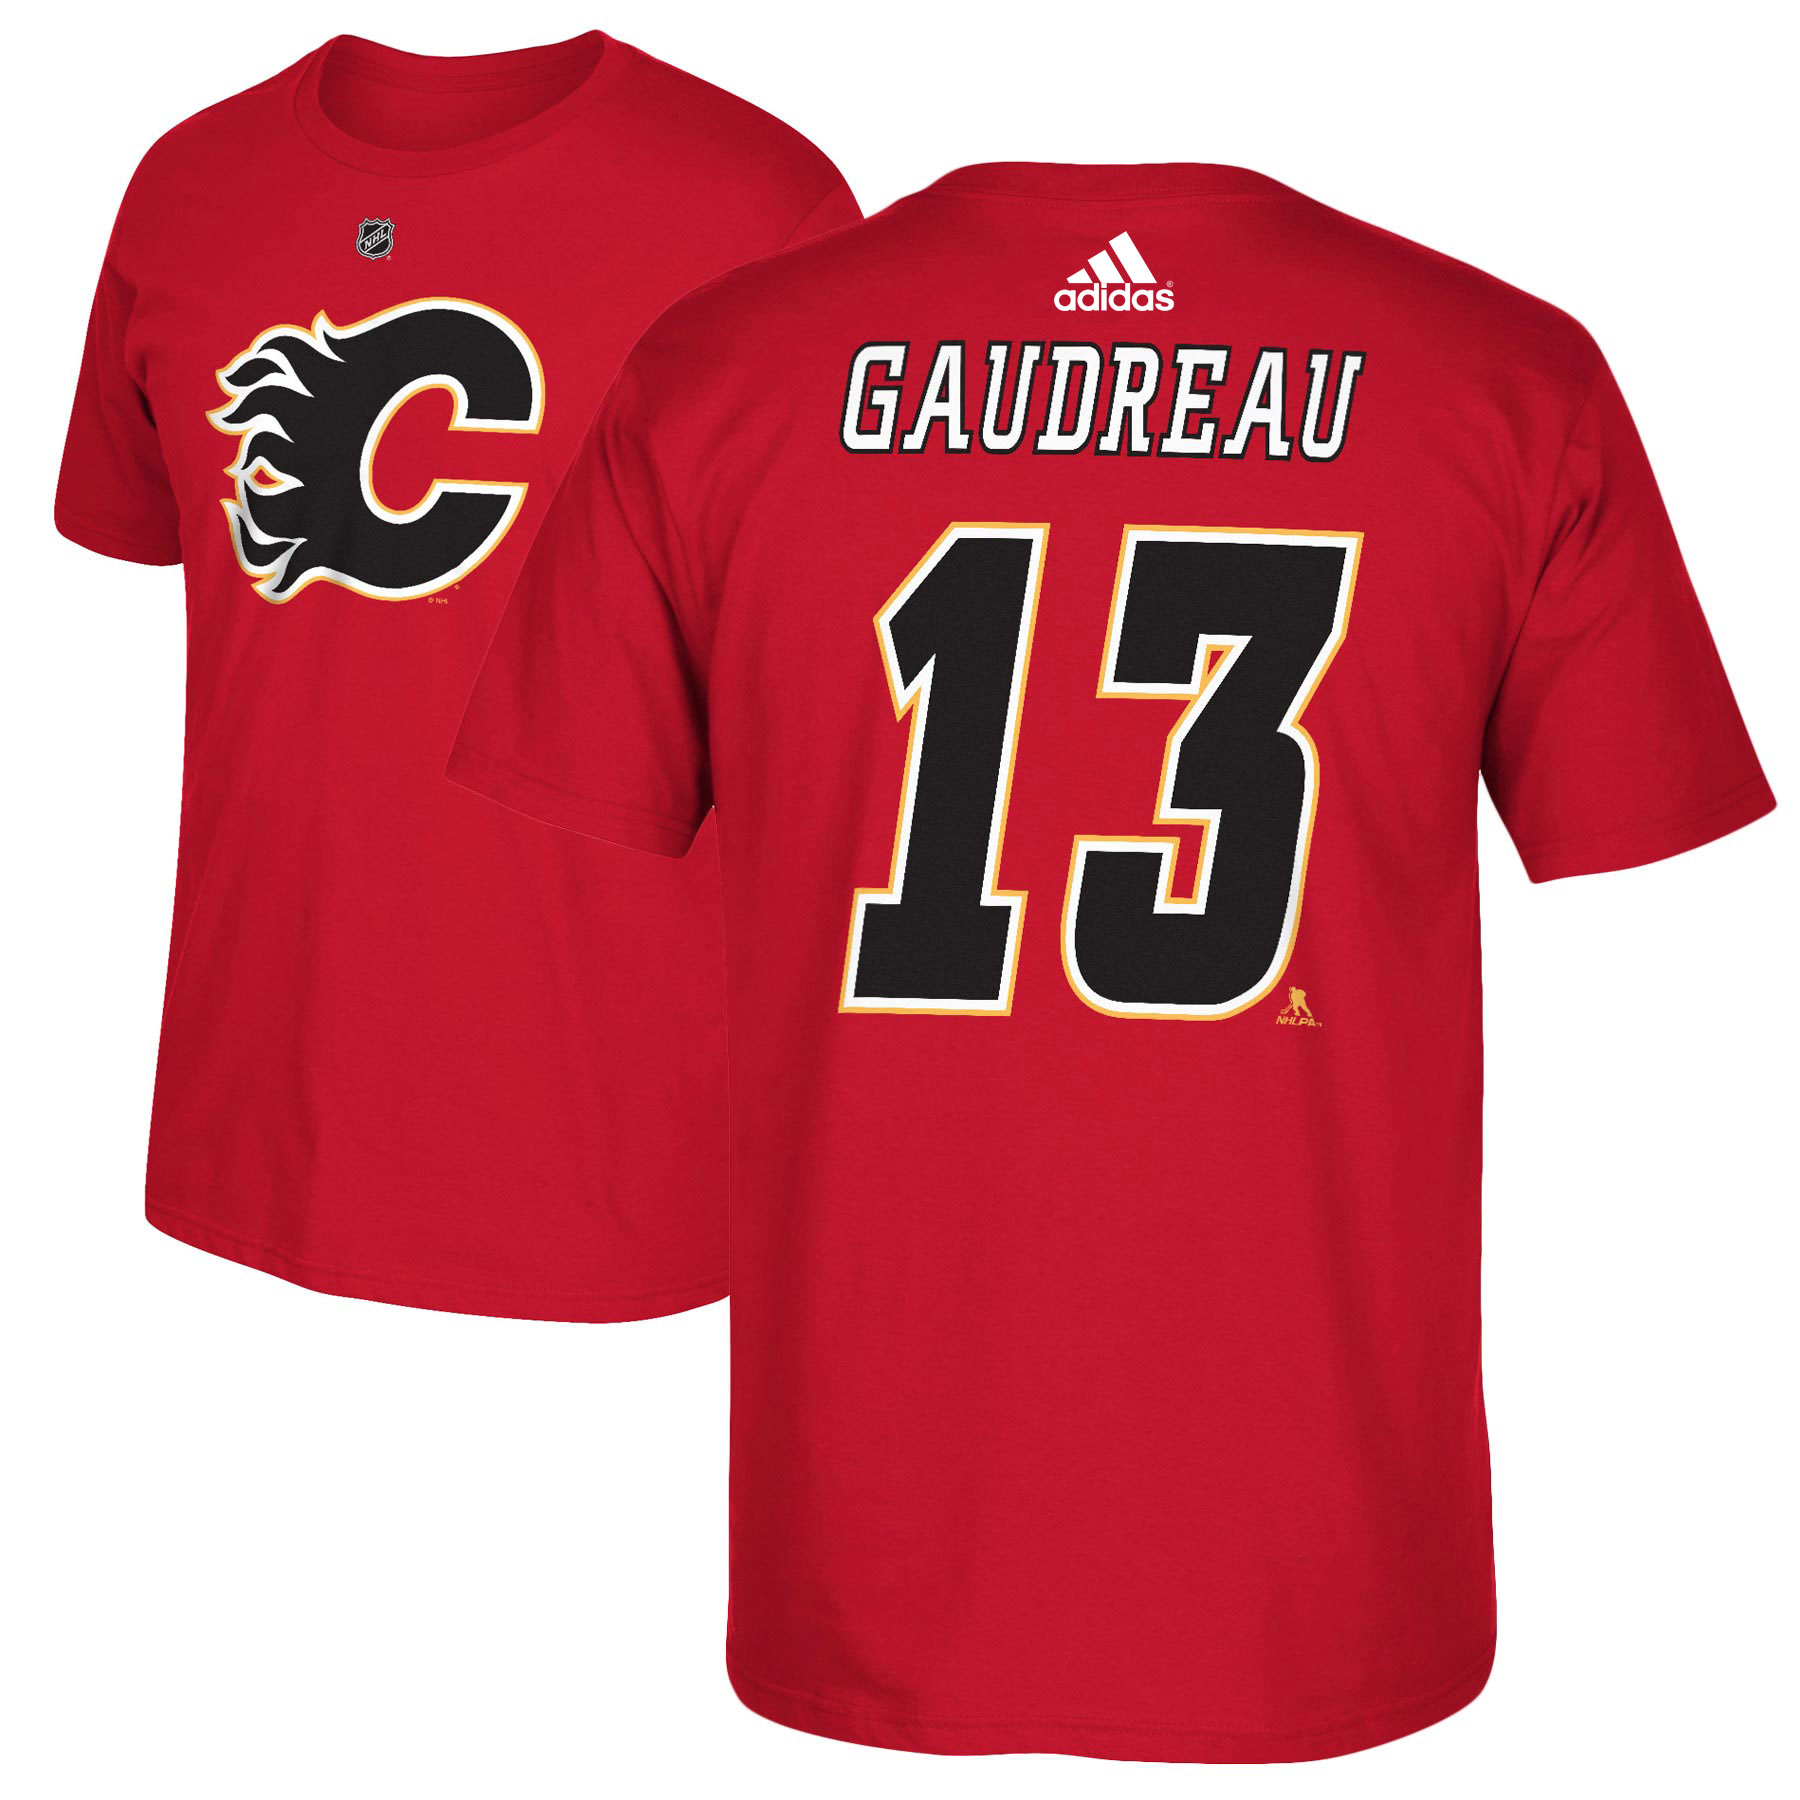 Calgary Flames Johnny Gaudreau Adidas NHL Silver Player Name & Number T-Shirt - image 2 de 2